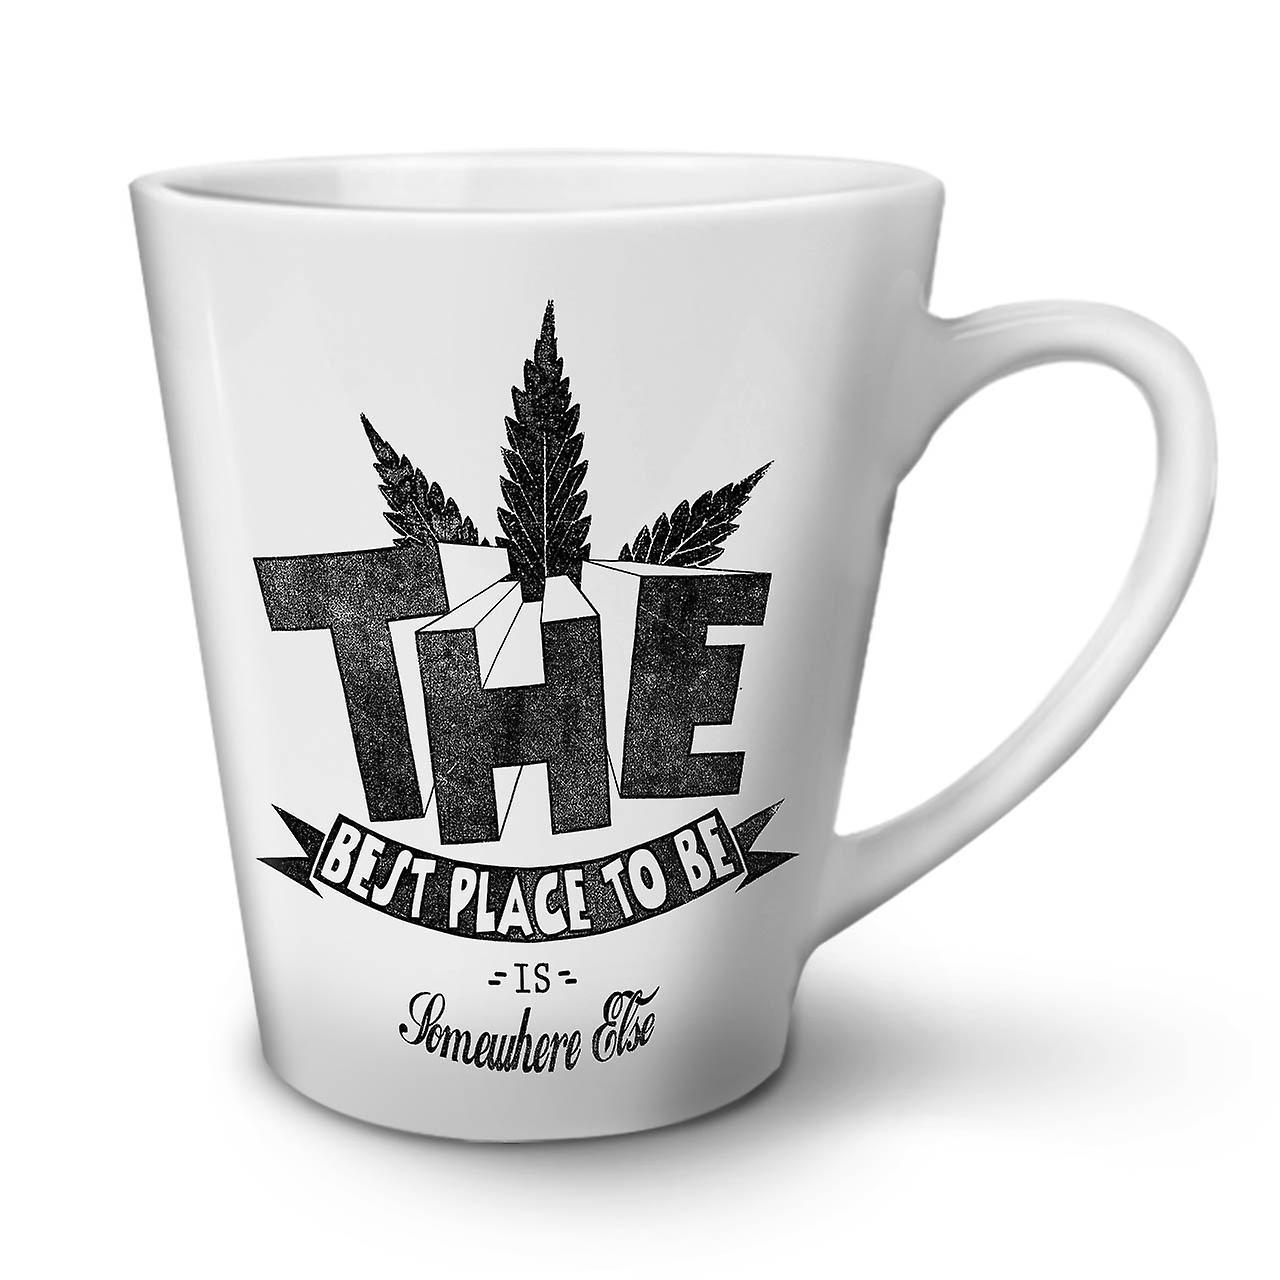 Best Place Weed Pot NEW White Tea Coffee Ceramic Latte Mug 12 oz | Wellcoda